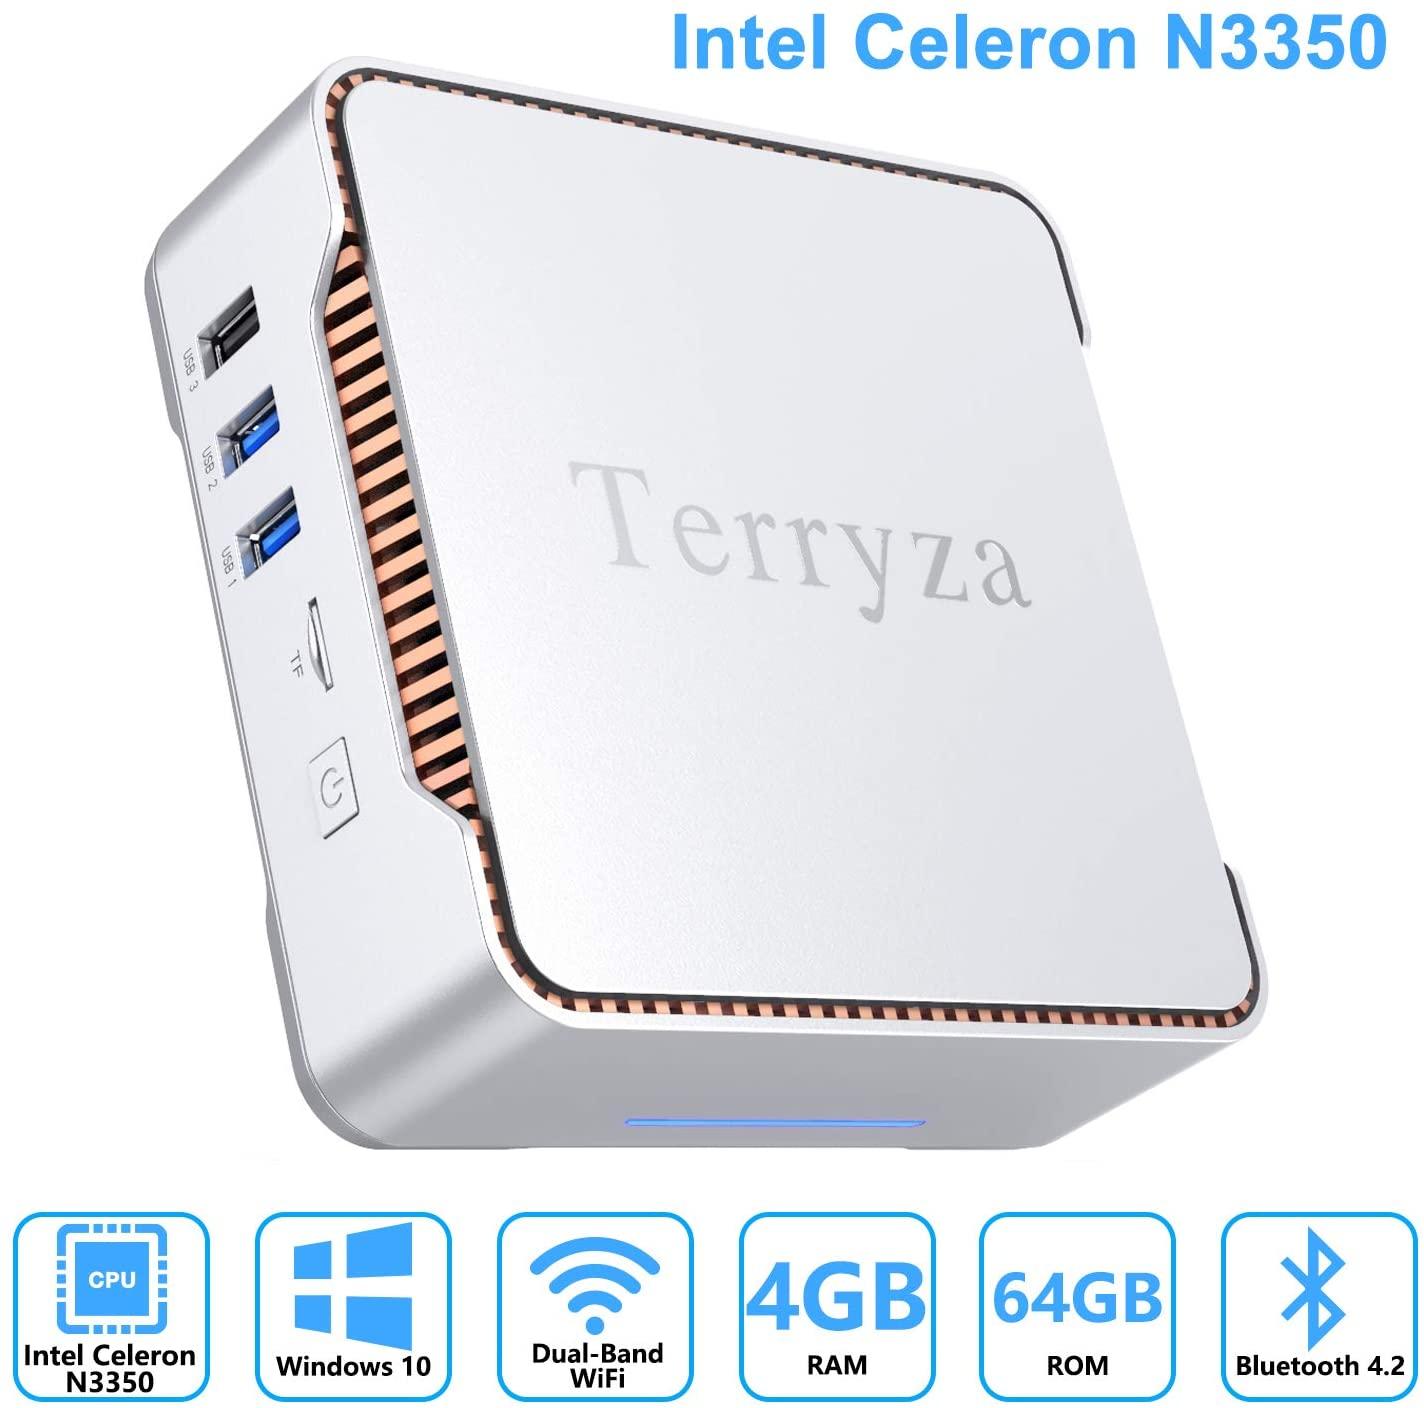 Terryza Mini PC Intel Celeron N3350 (up to 2.4GHz) Mini Computer with Window 10 Pro 64bit 4GB DDR3+64GB eMMC,Dual Band Wi-Fi 2.4G/5G,HDMI/VGA Port Three Display, Gigabit Ethernet, 4K HD,BT 4.2